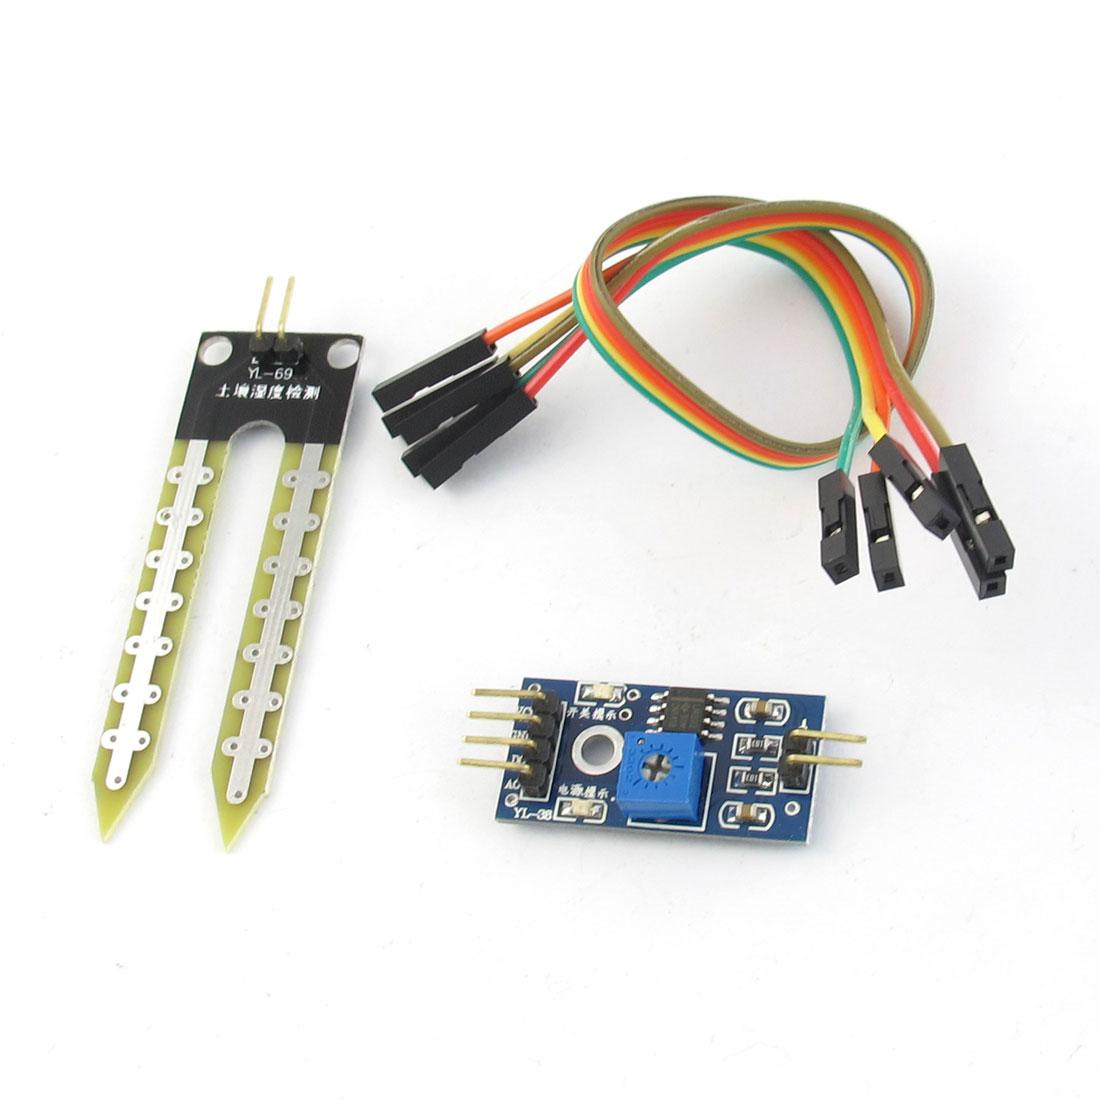 DC 3.3-5V Moisture Sensitive Soil Hygrometer Sensor Detection Control PCB Board Module